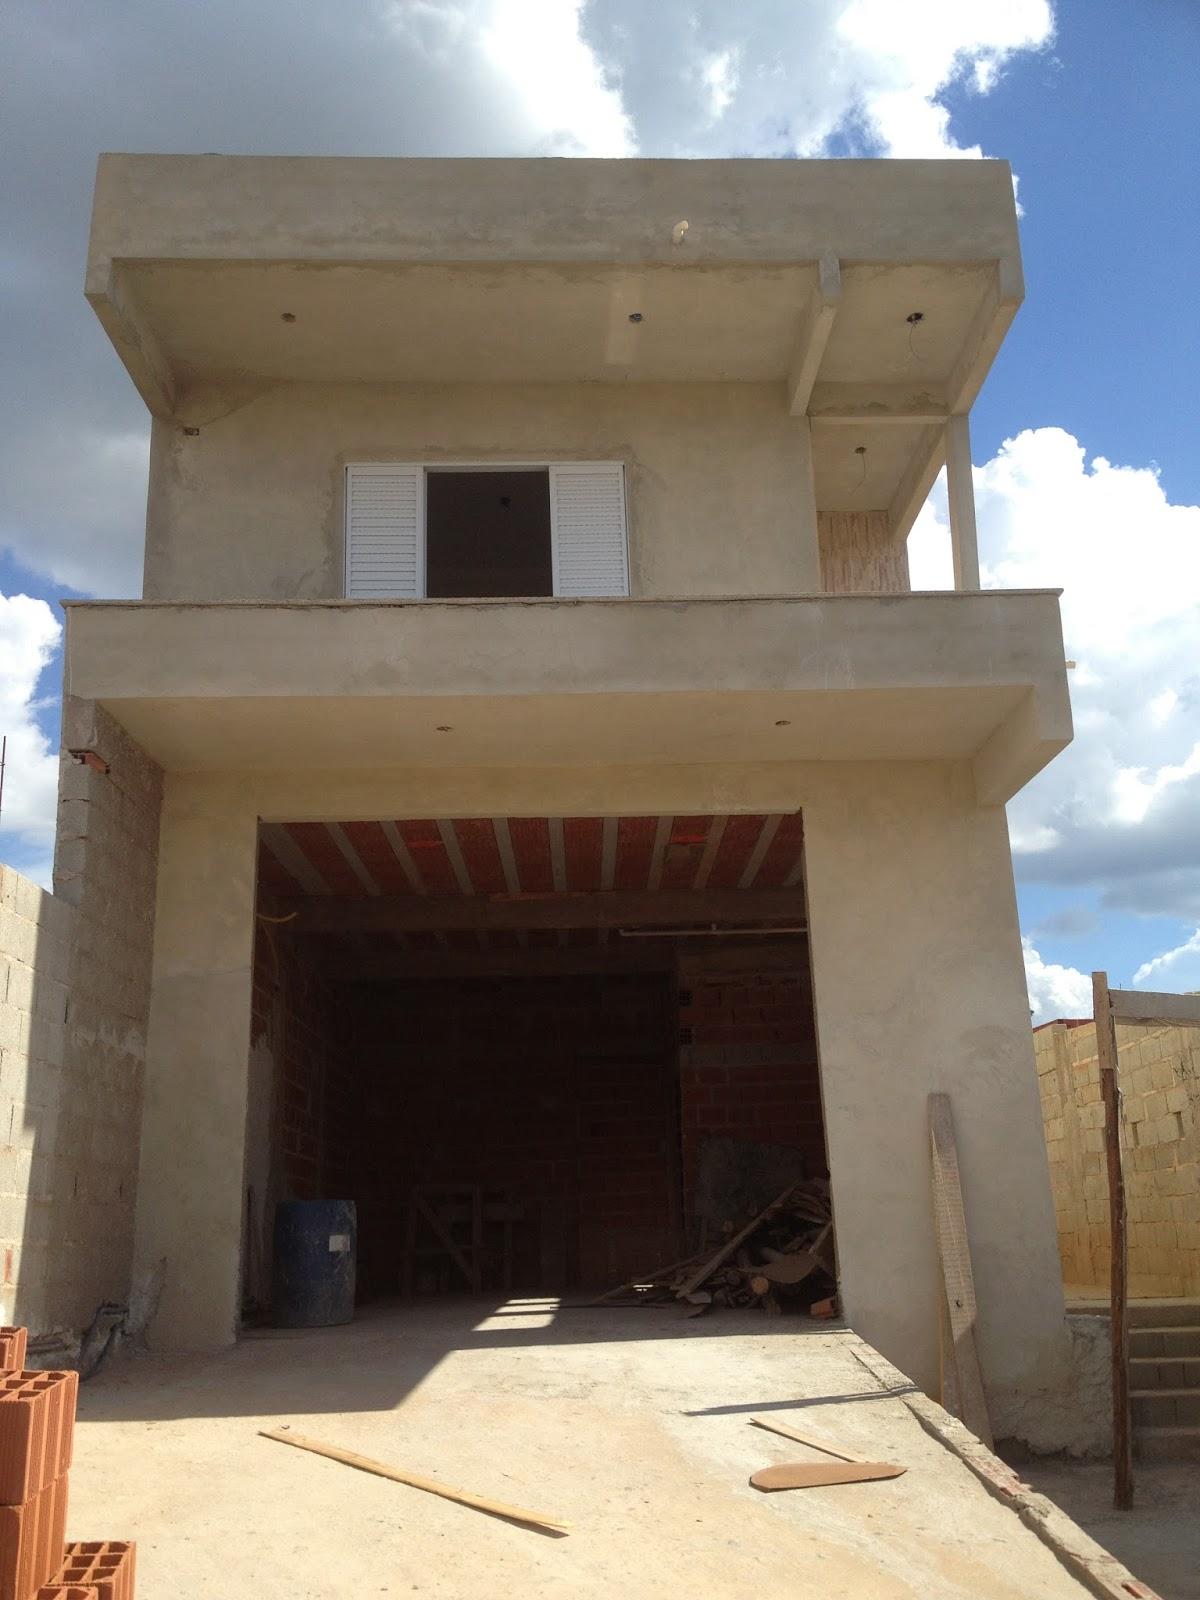 Promessa de deus construindo um sonho fase 5 rea for Casa in cima al garage